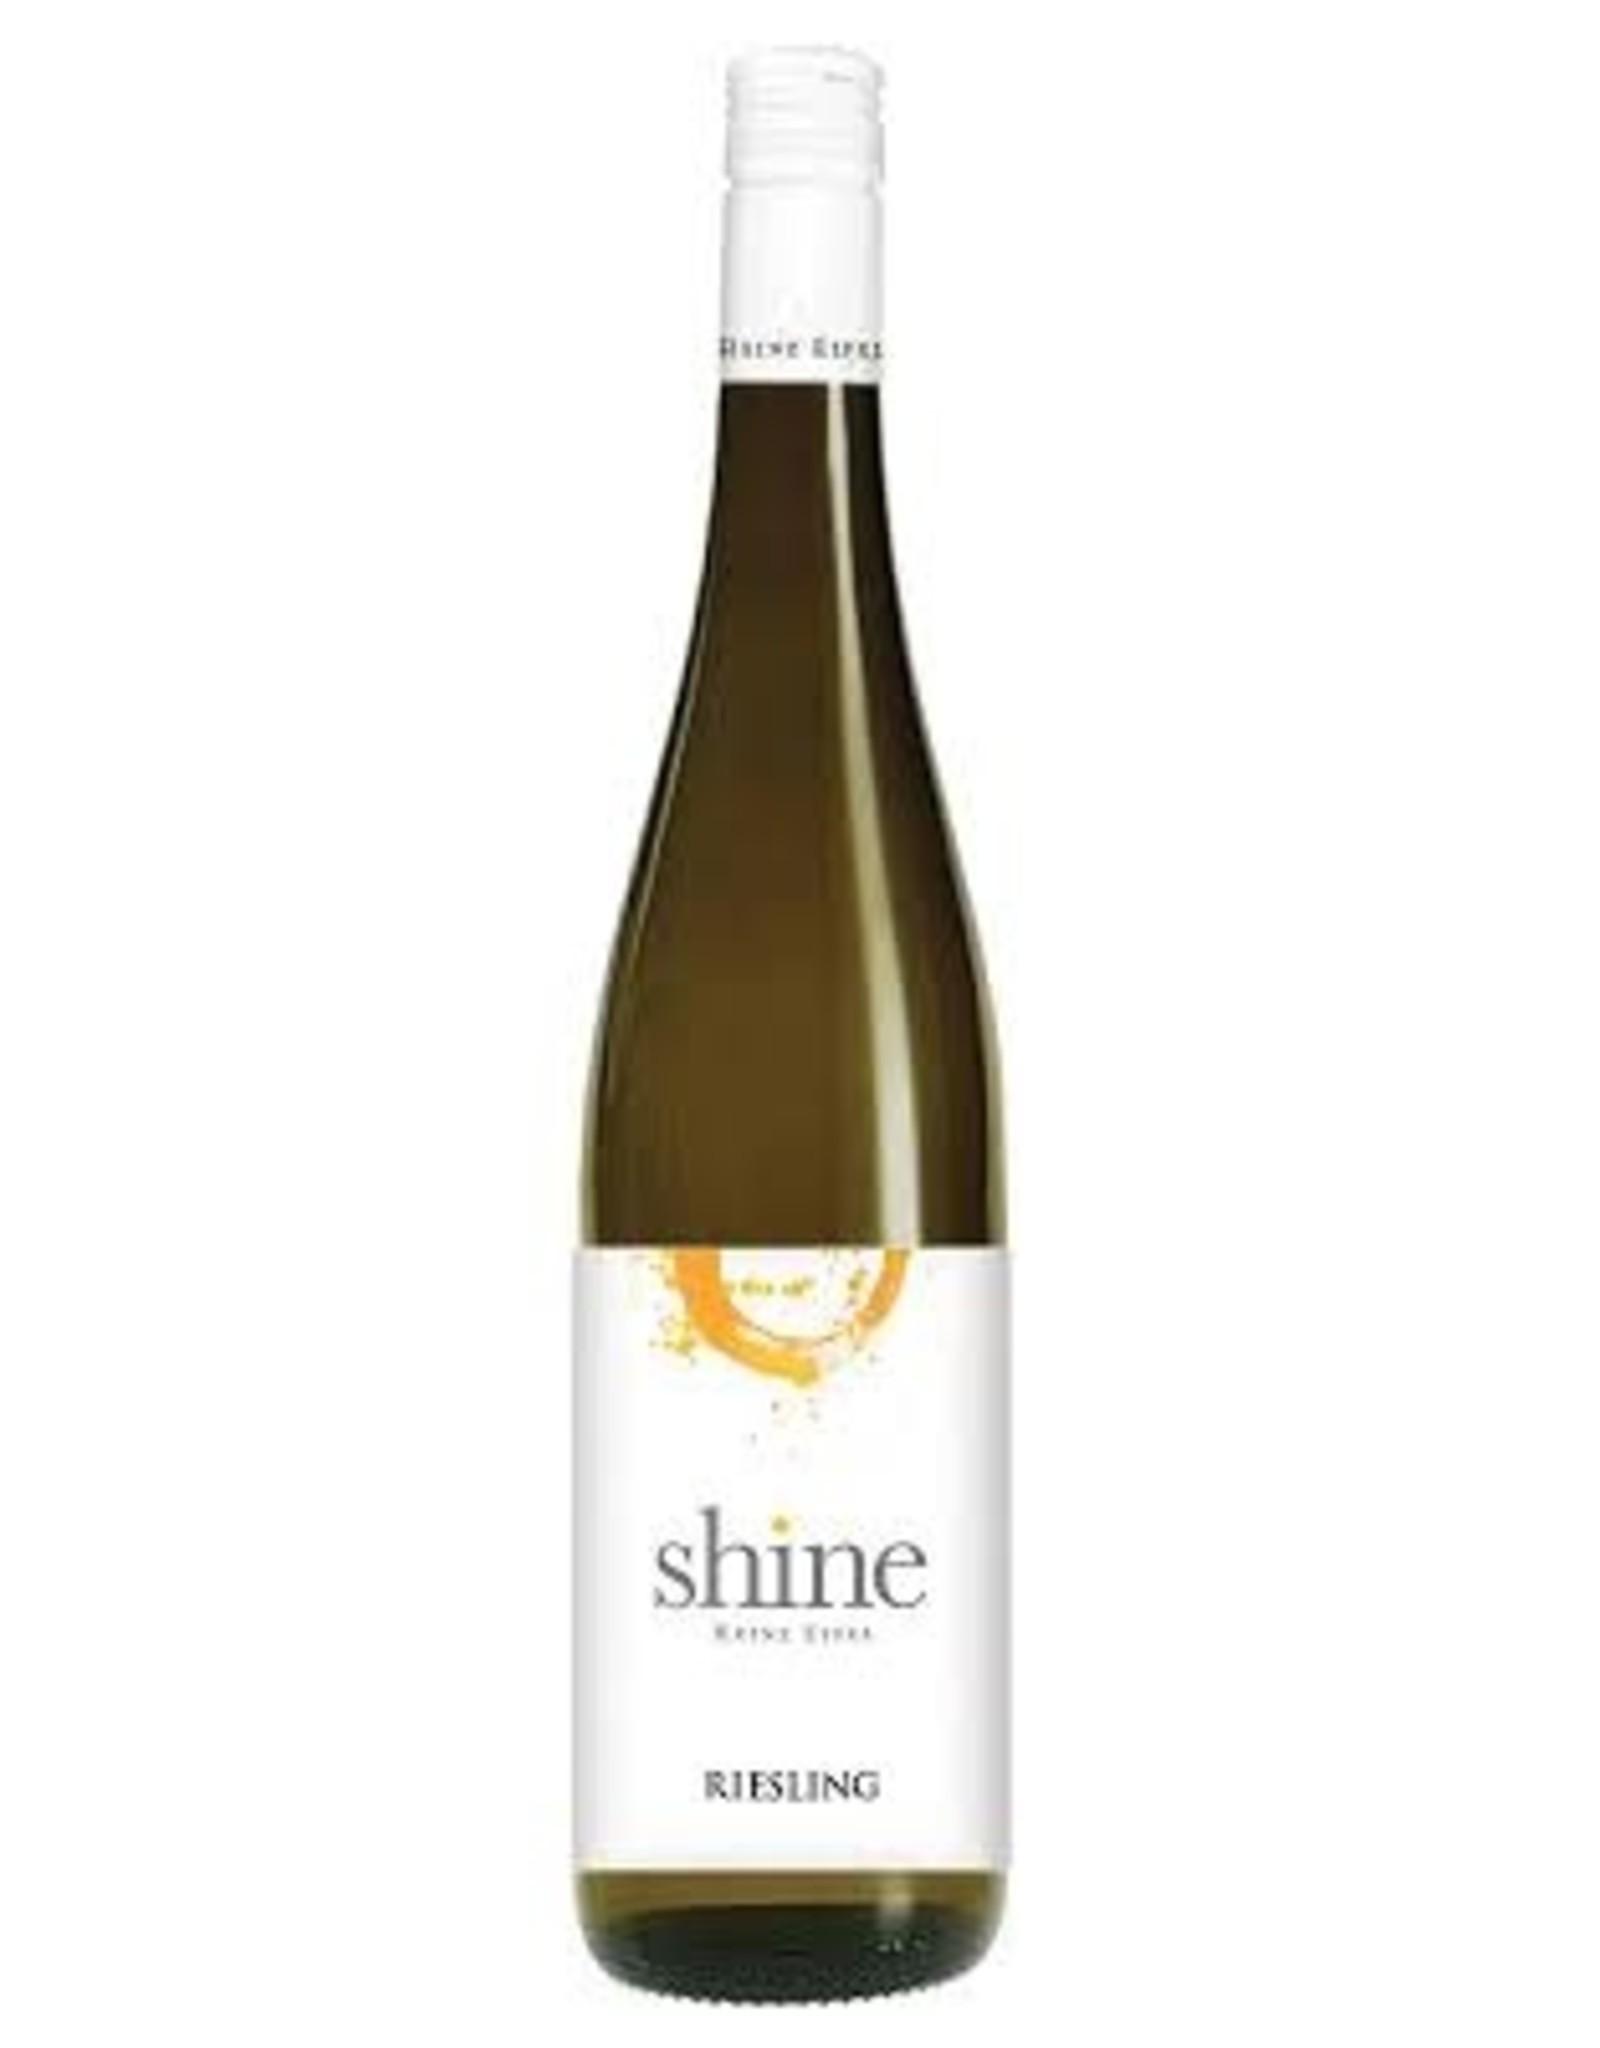 Eifel Riesling Shine